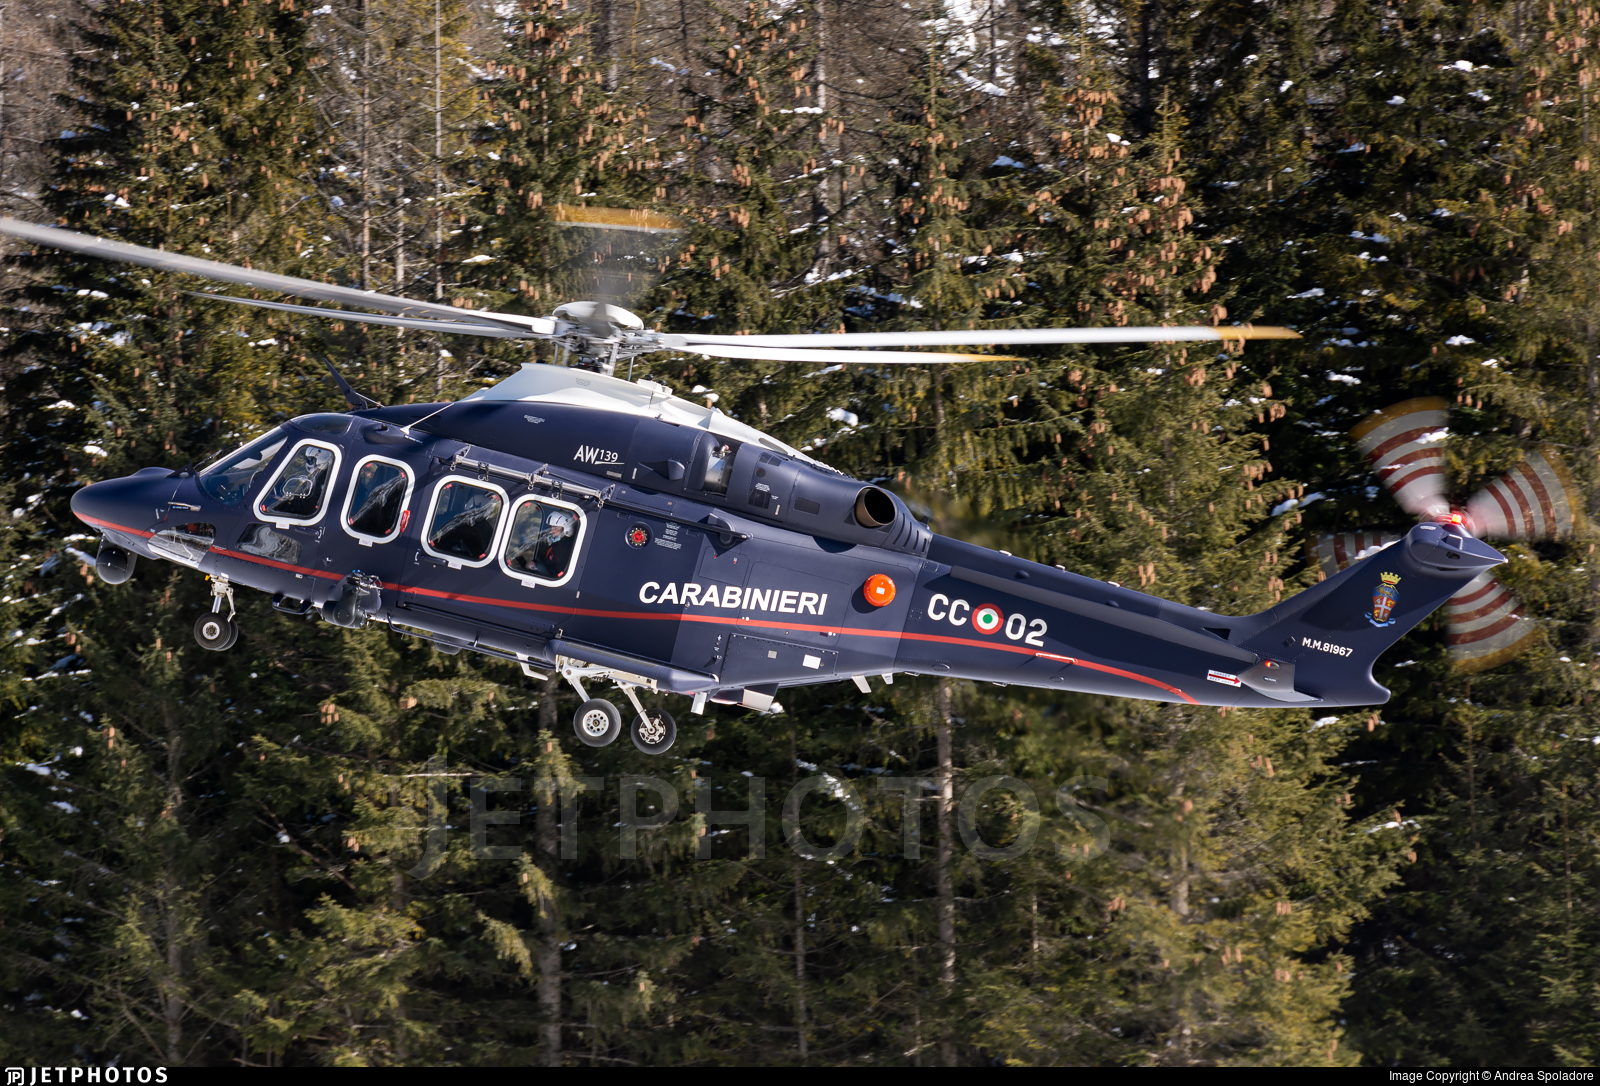 MM81967 - Agusta-Westland AW-139 - Italy - Arma dei Carabinieri